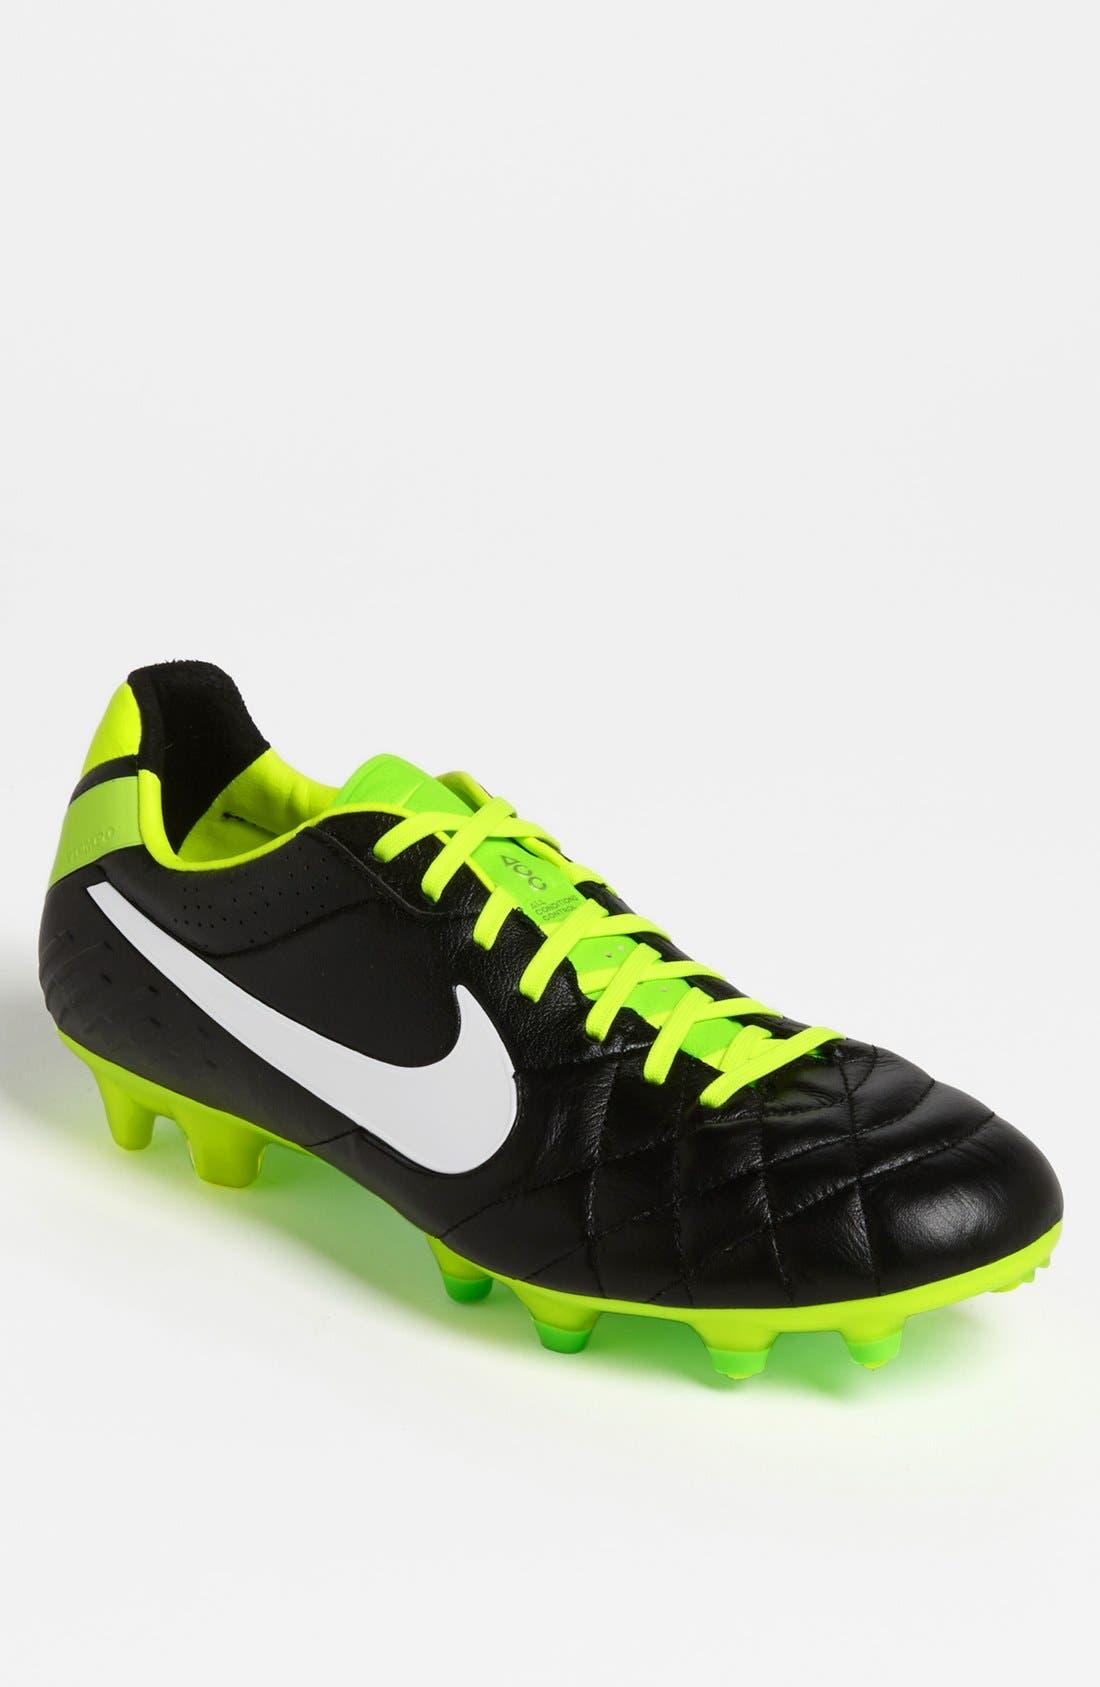 Main Image - Nike 'Tiempo Legend IV FG' Soccer Cleat (Men)